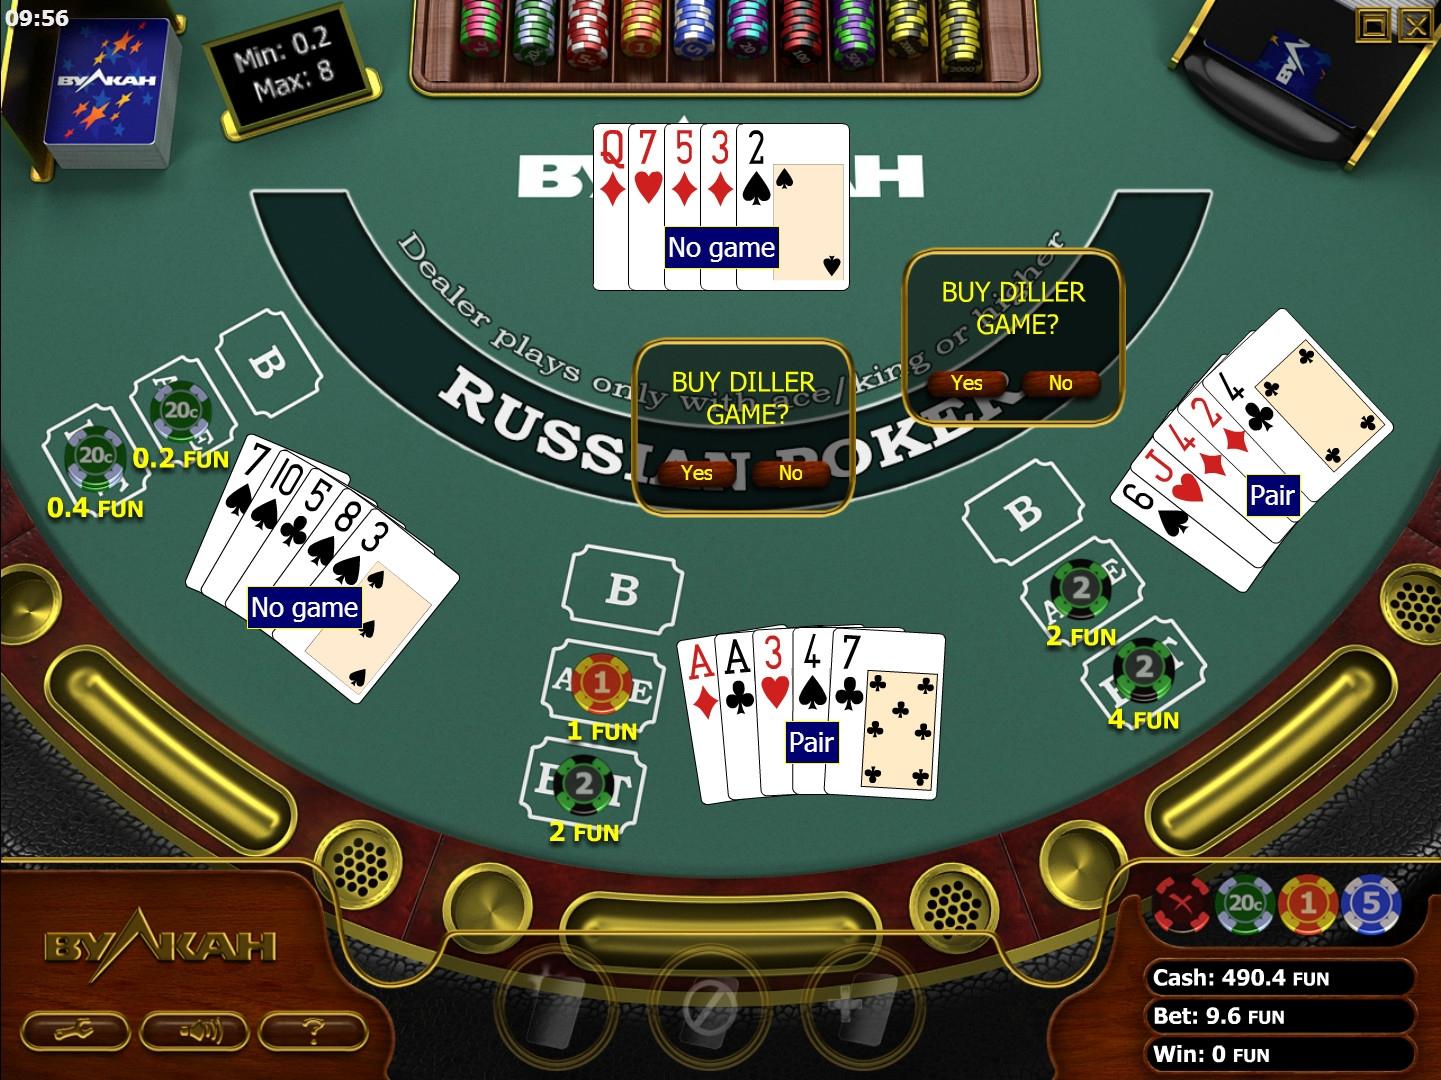 Онлайн казино play fortuna зеркало сайта работающее